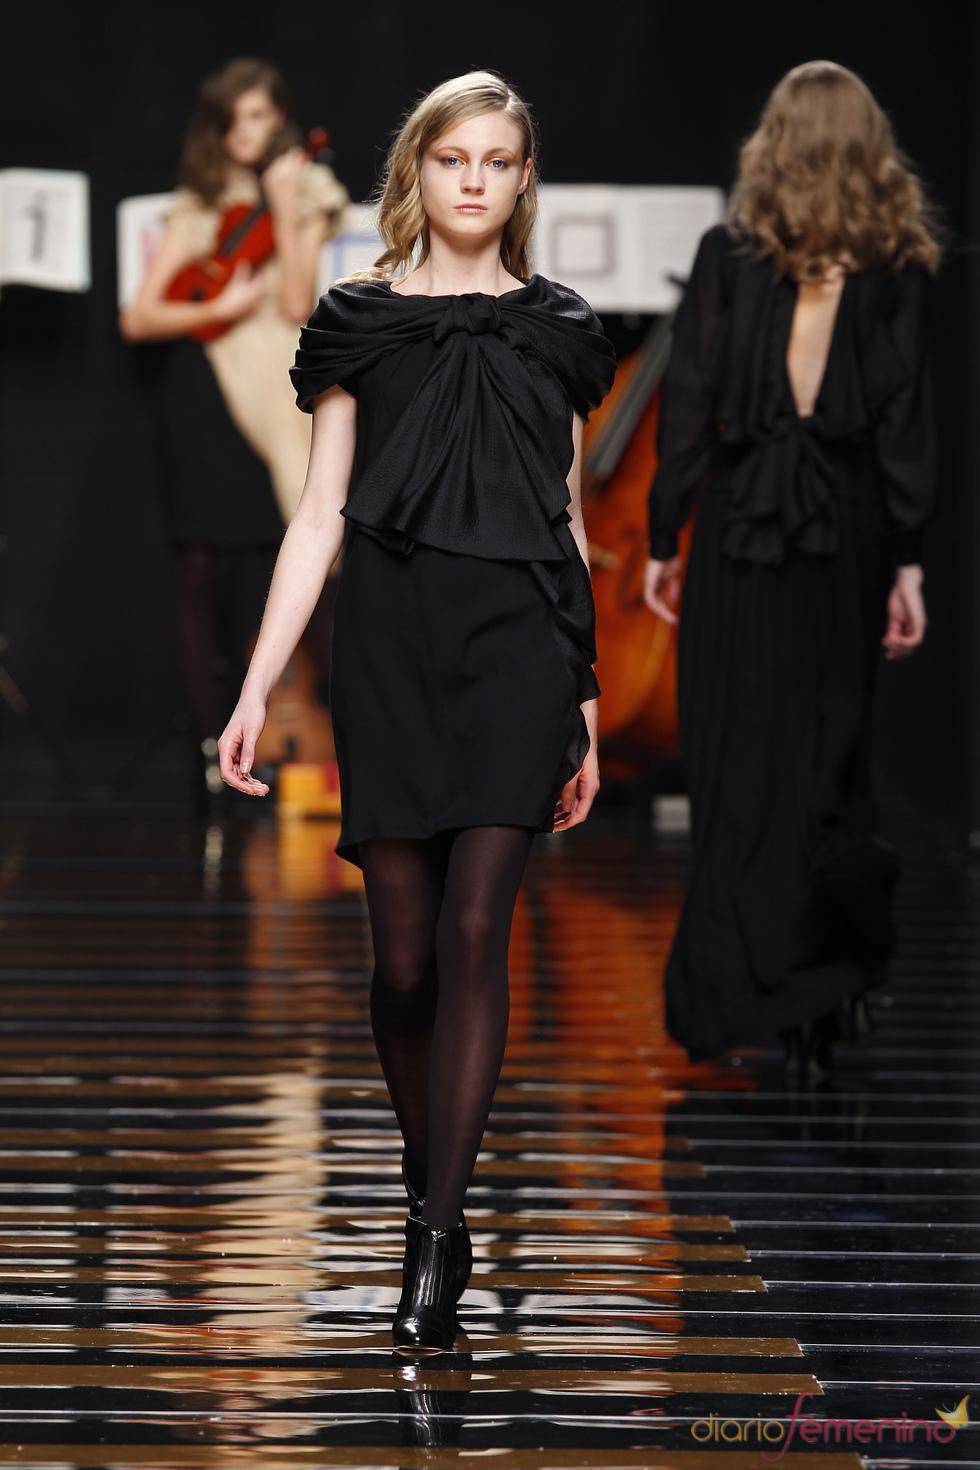 Fotos Ailanto: Cibeles Madrid Fashion Week 2010